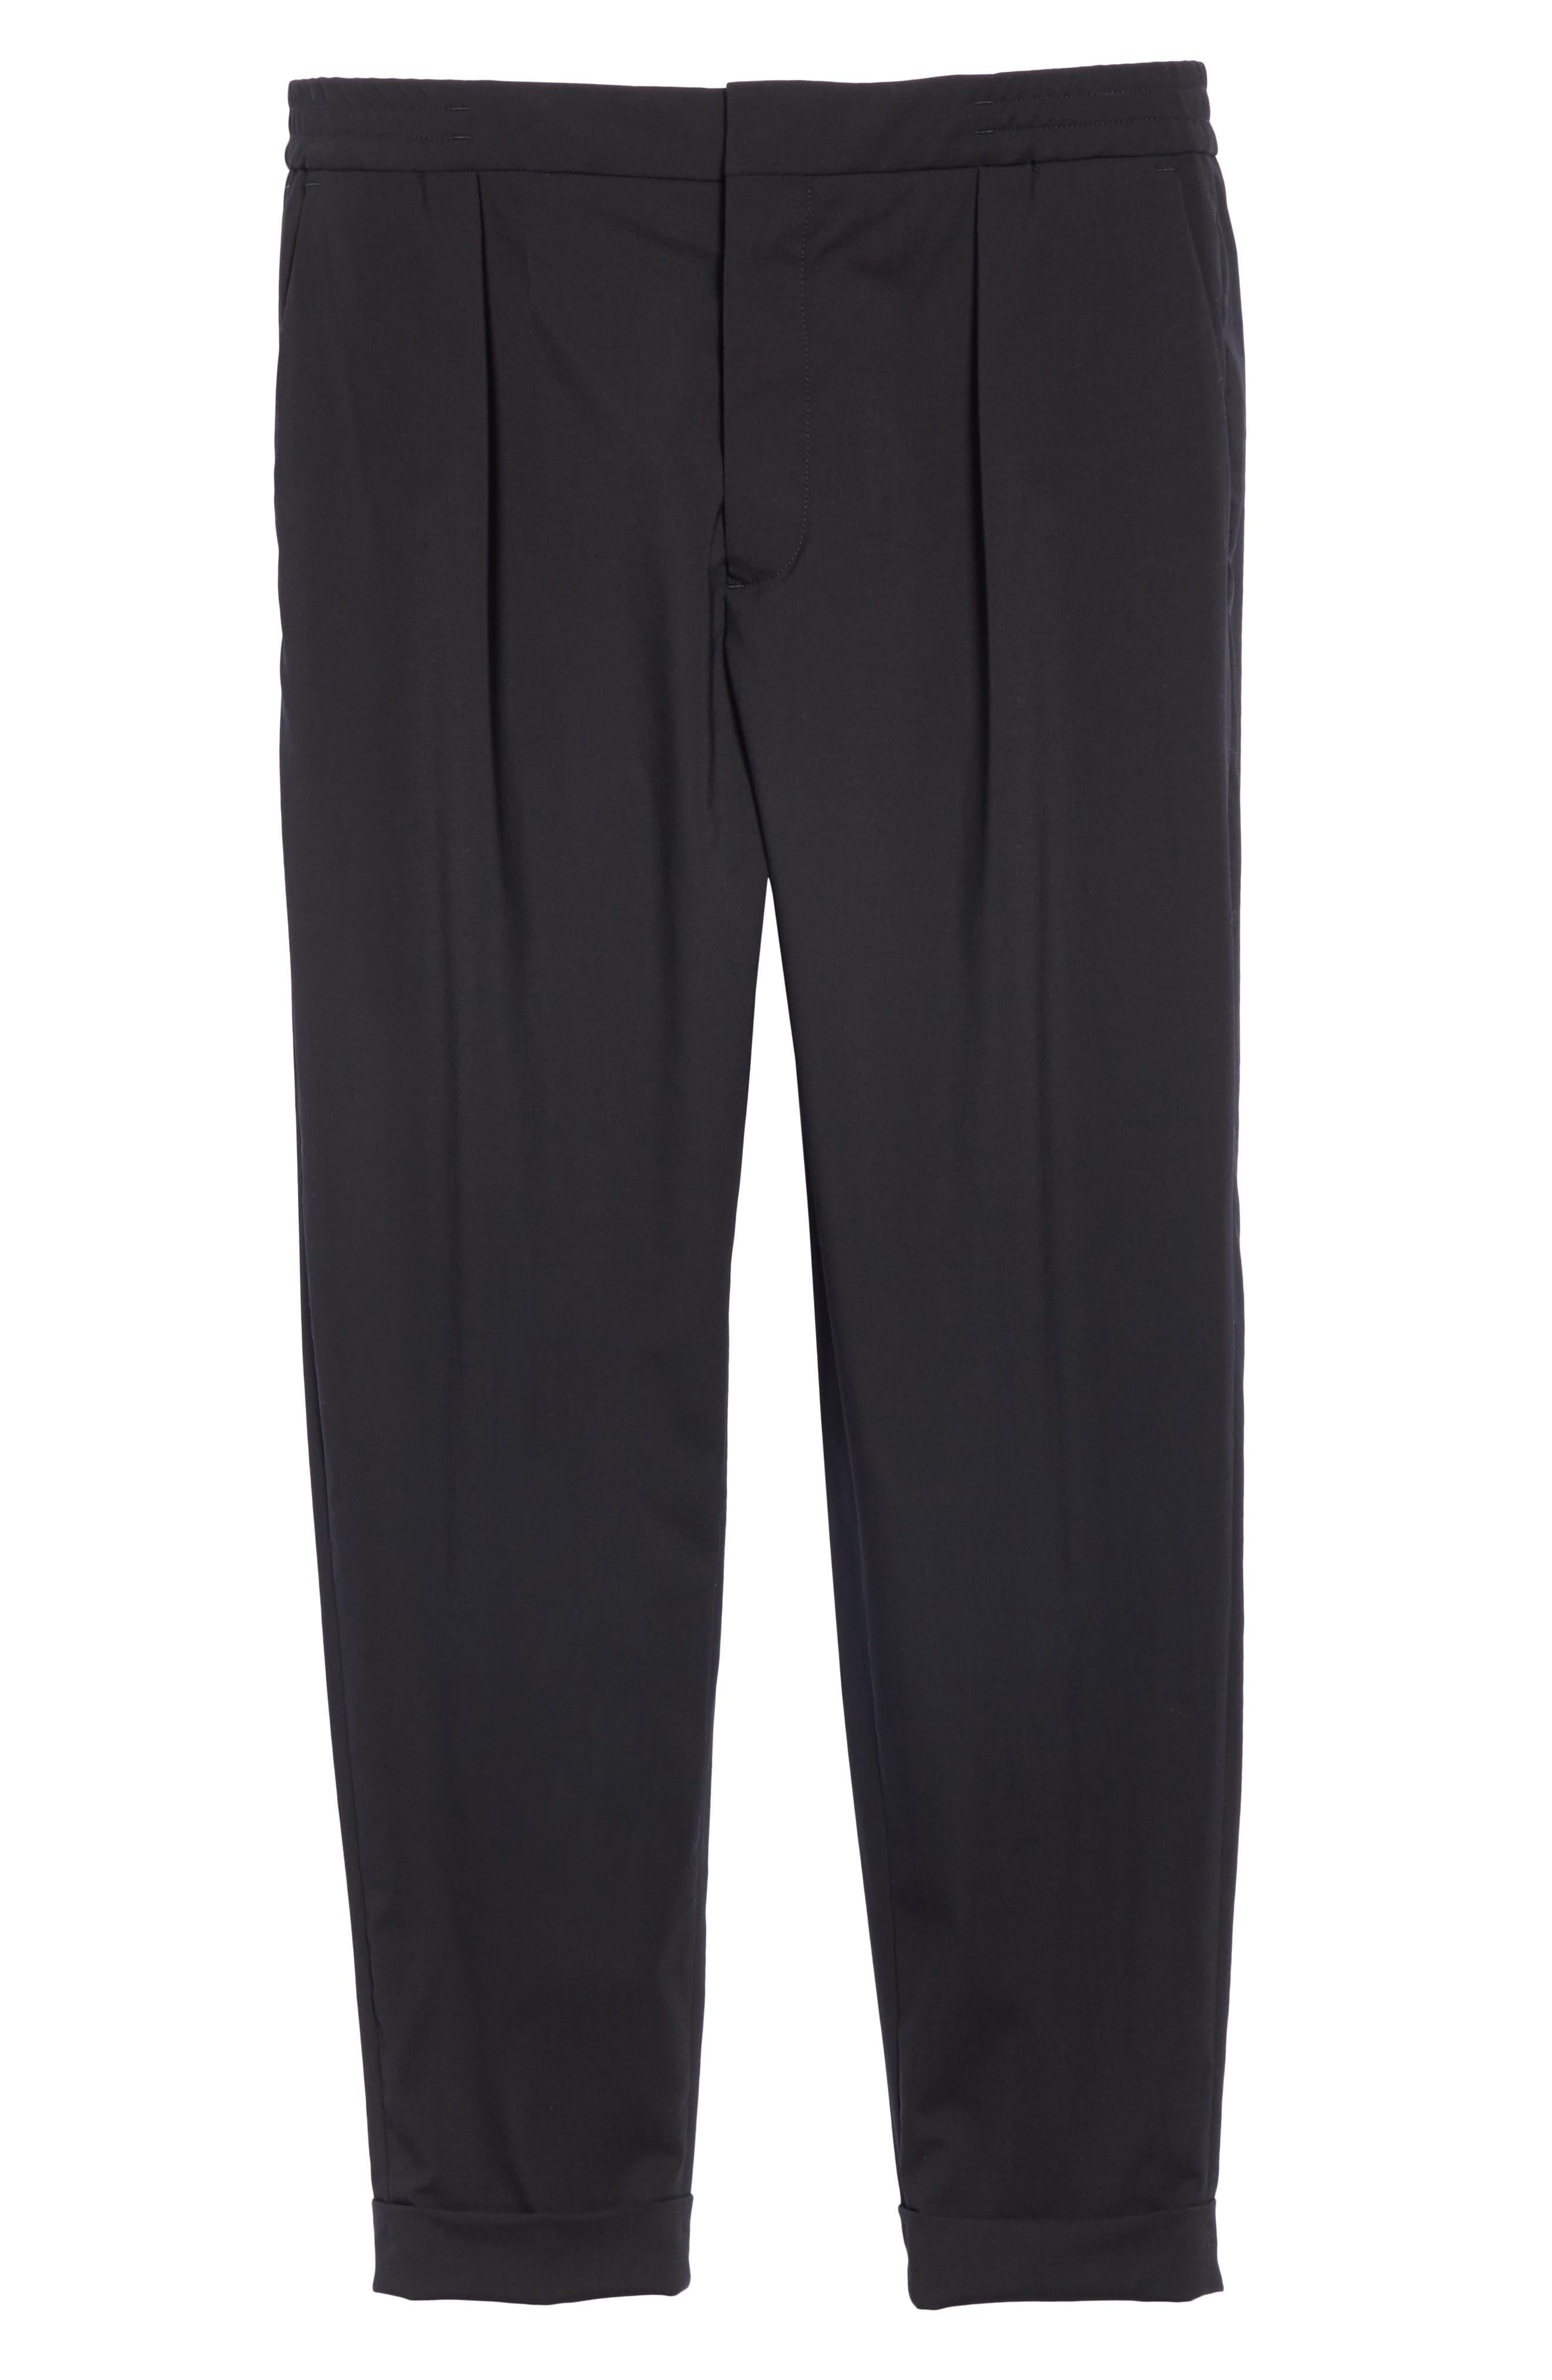 Barena Venzia Tropical Wool Pants,                             Alternate thumbnail 6, color,                             001